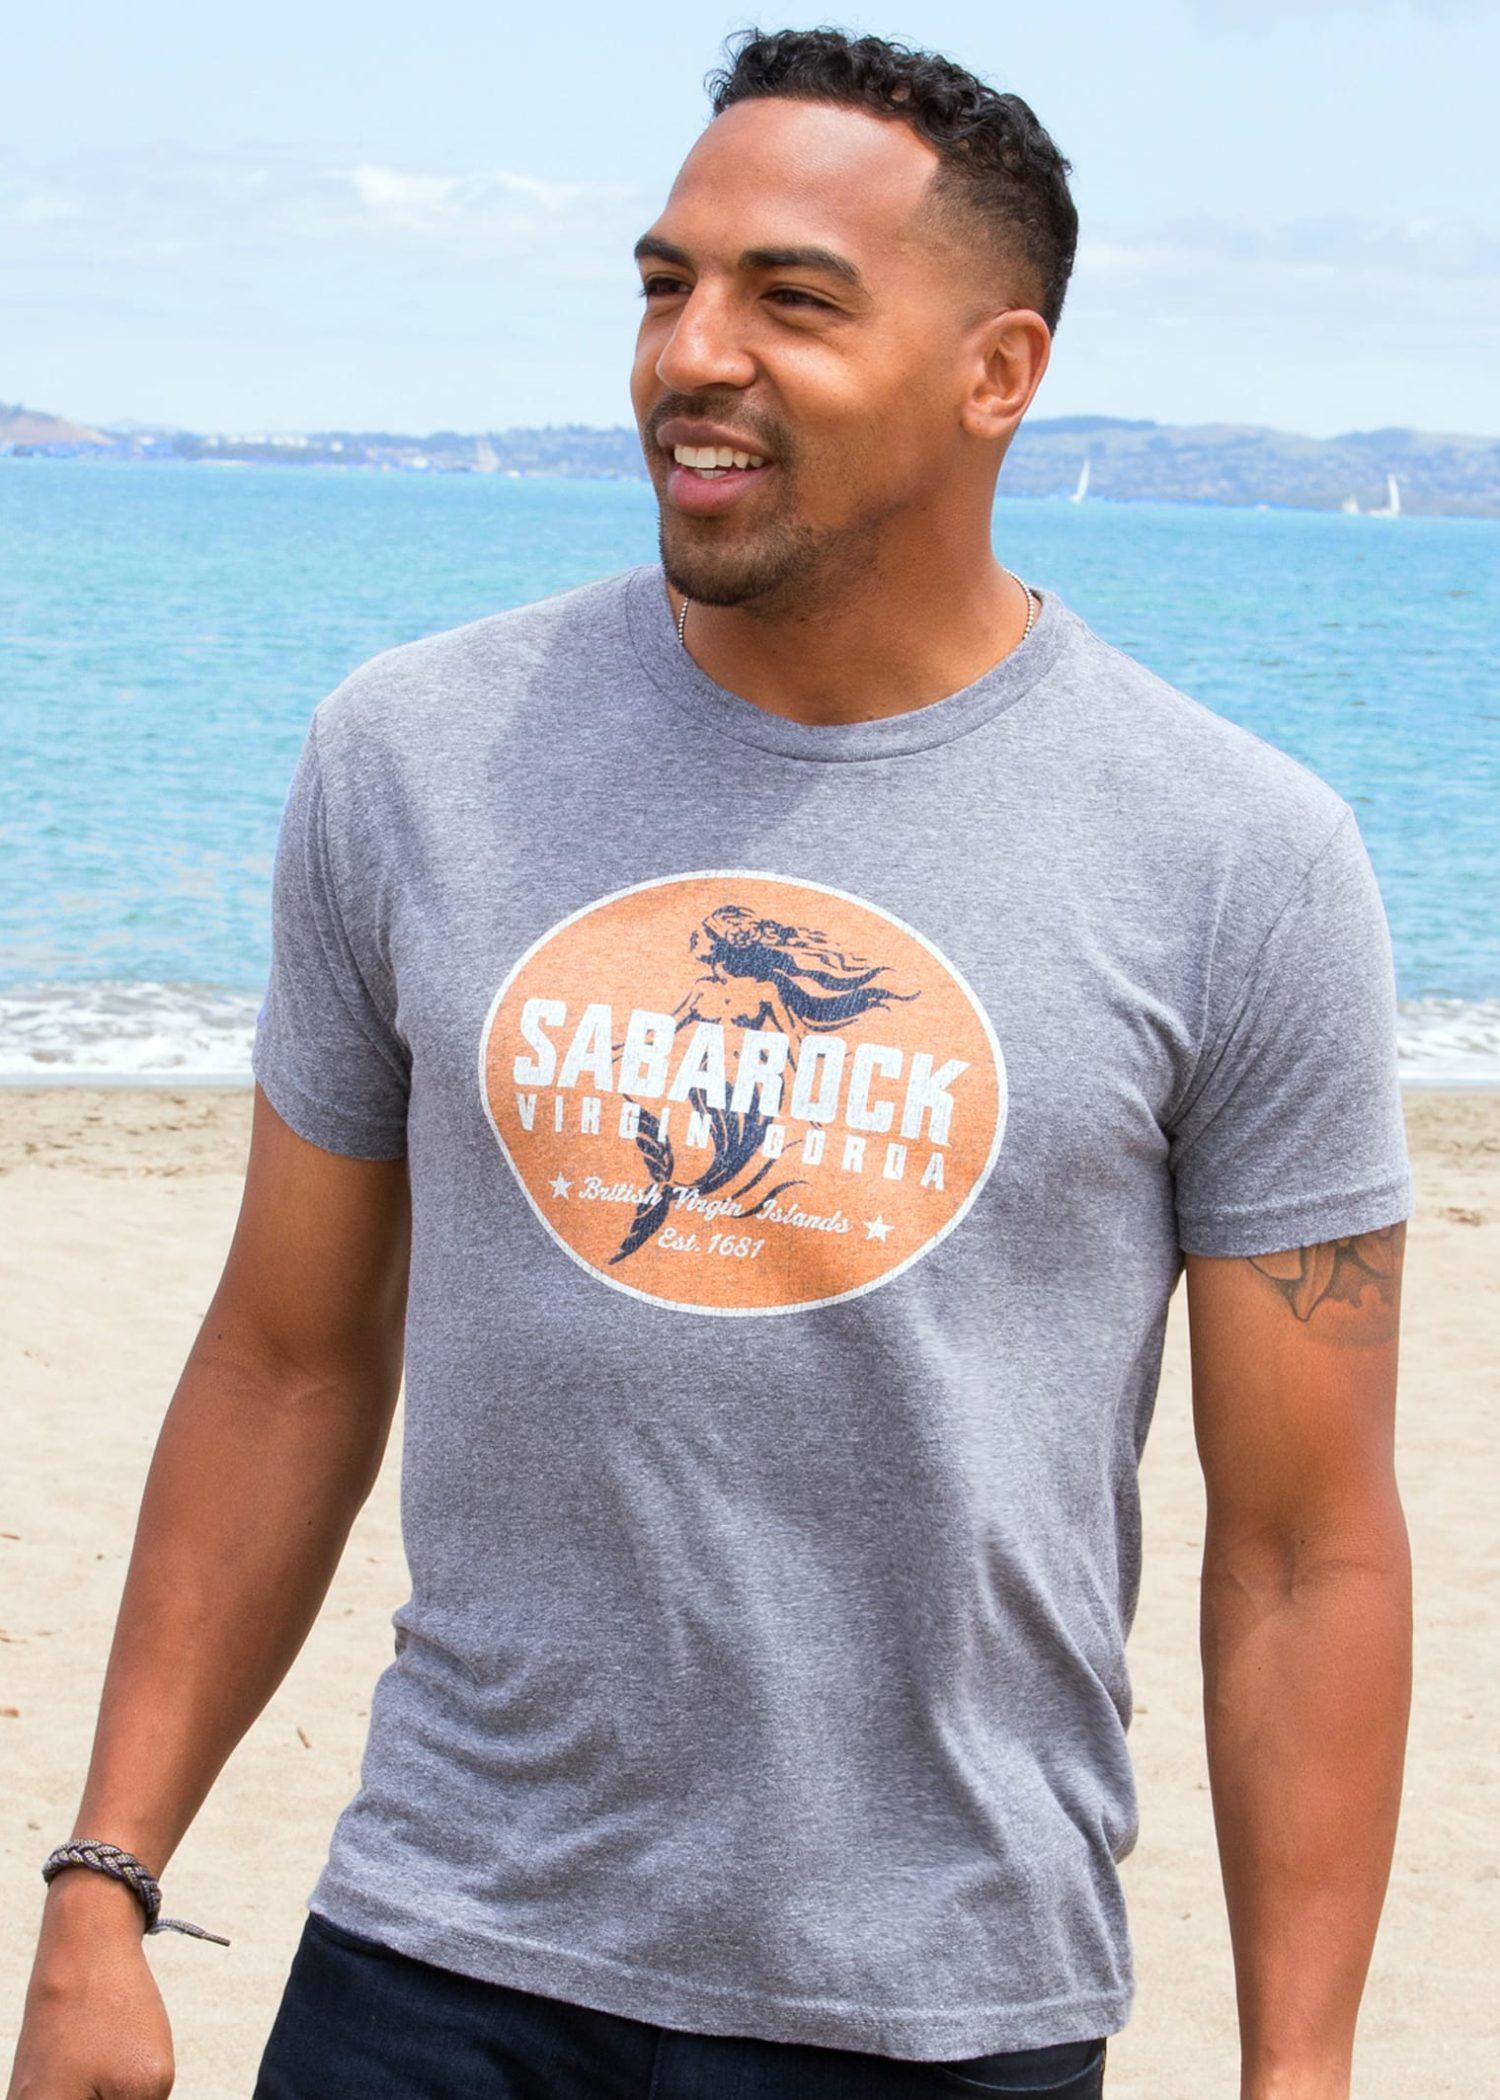 Men's Saba Rock Triblend Jersey Crew T-Shirt